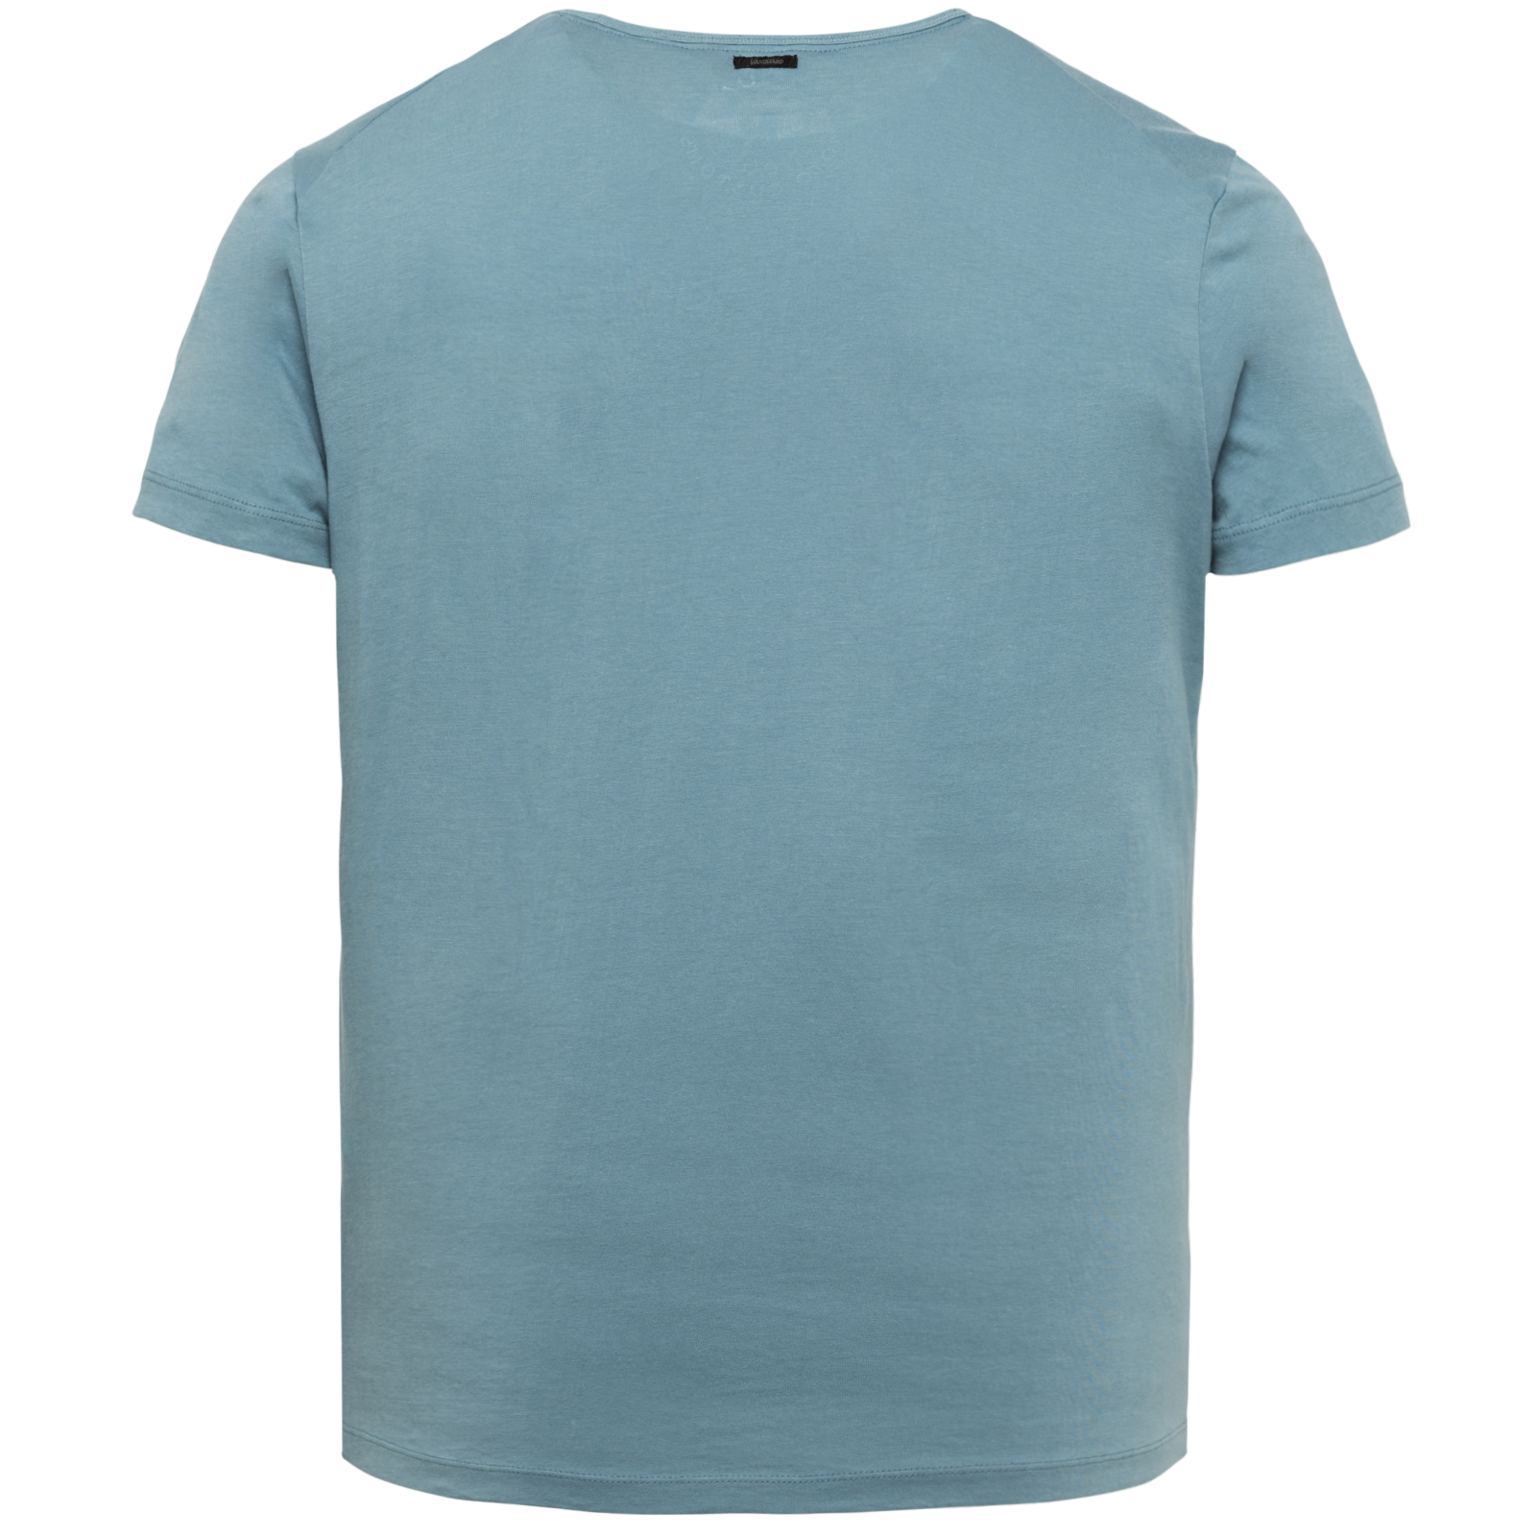 VANGUARD t-shirt jersey bamboo-2